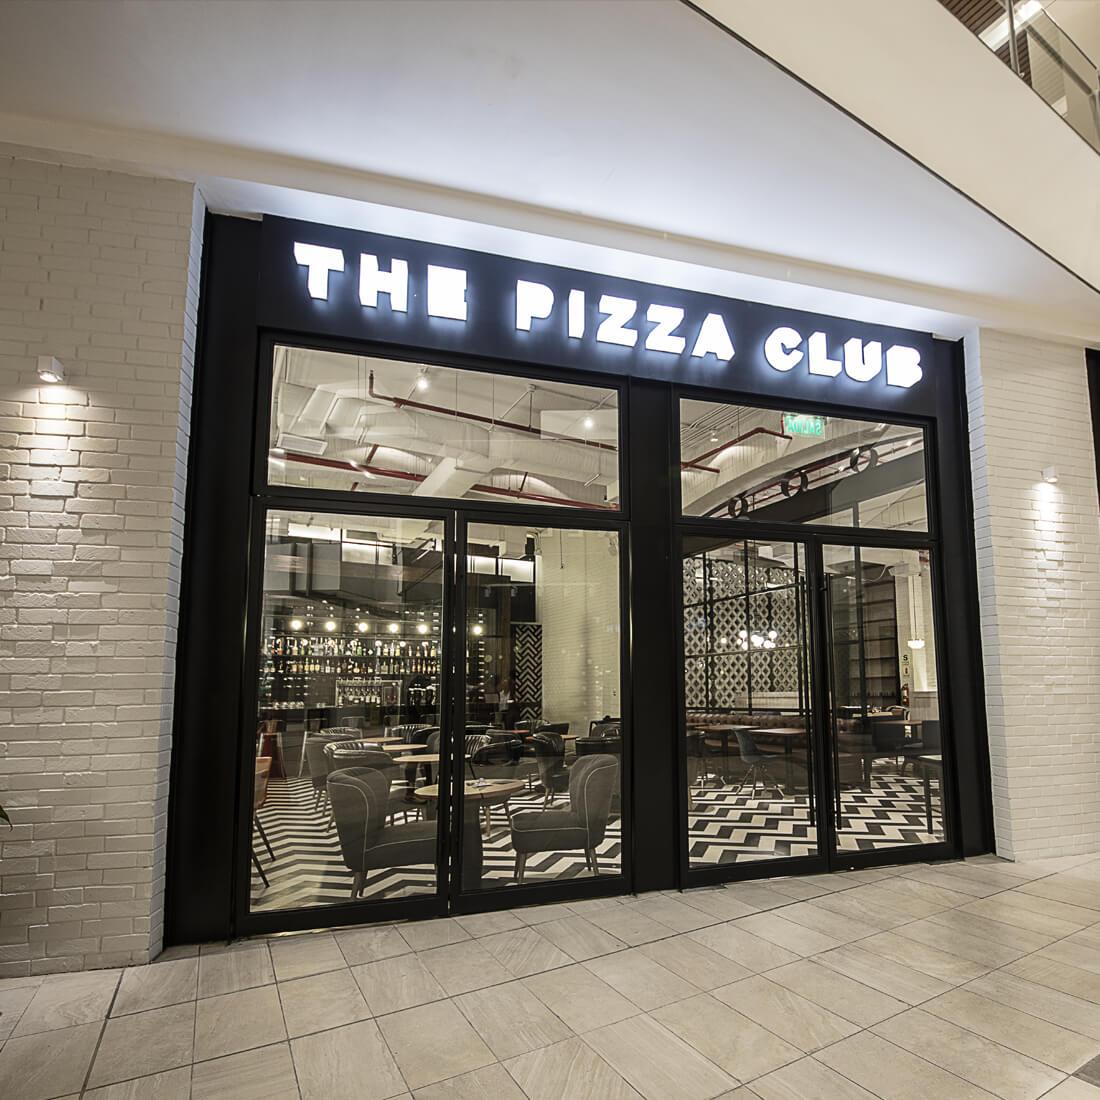 THE PIZZA CLUB Restaurant - and Peruvian Food ITALIAN - SANTIAGO DE SURCO - MESA 24/7 Guide | LIMA - Peru